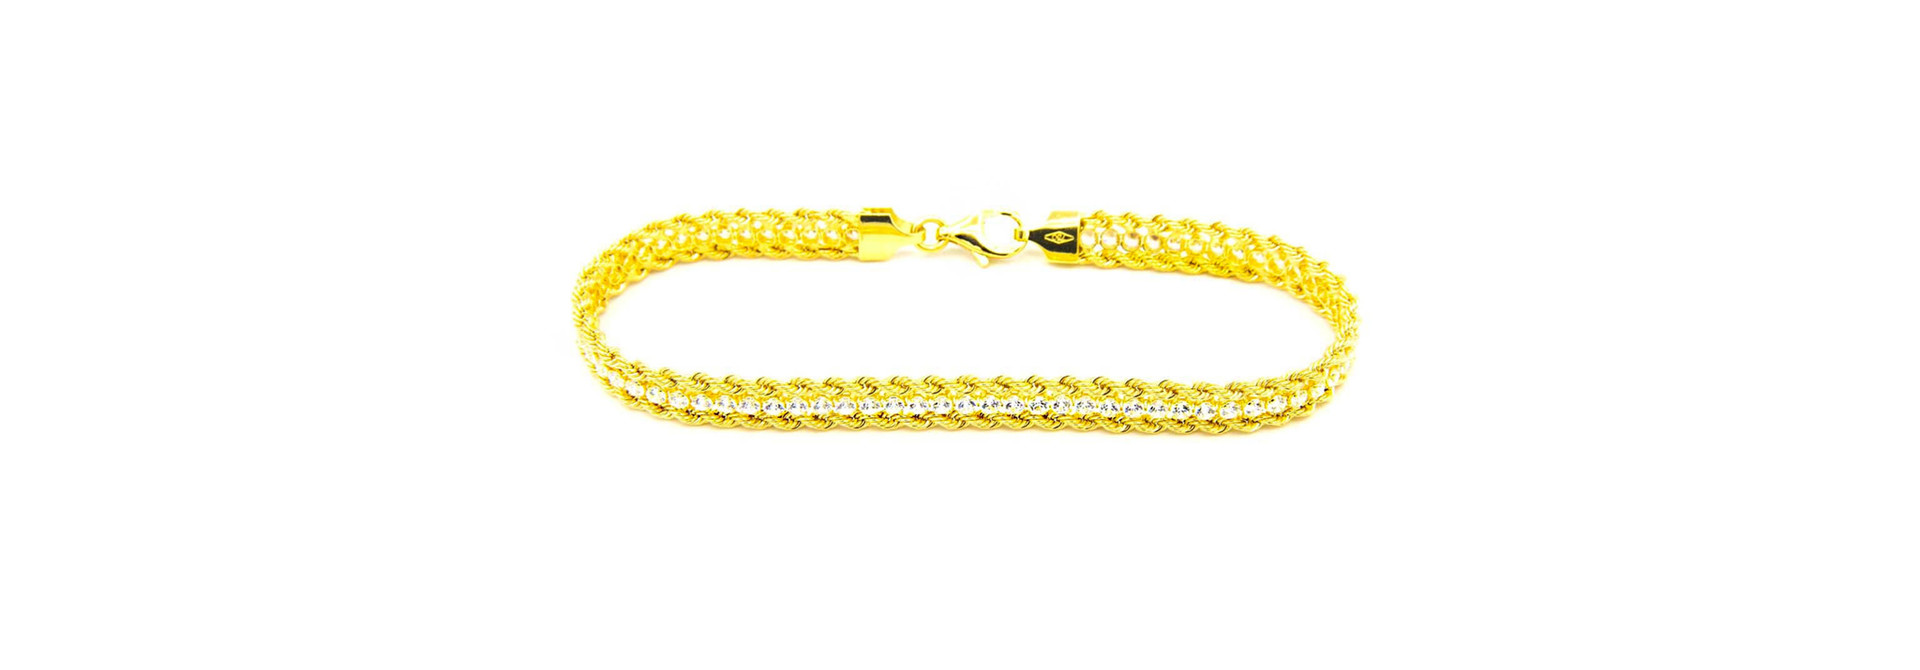 Armband dubbele rope chain met zirkonia's ertussen